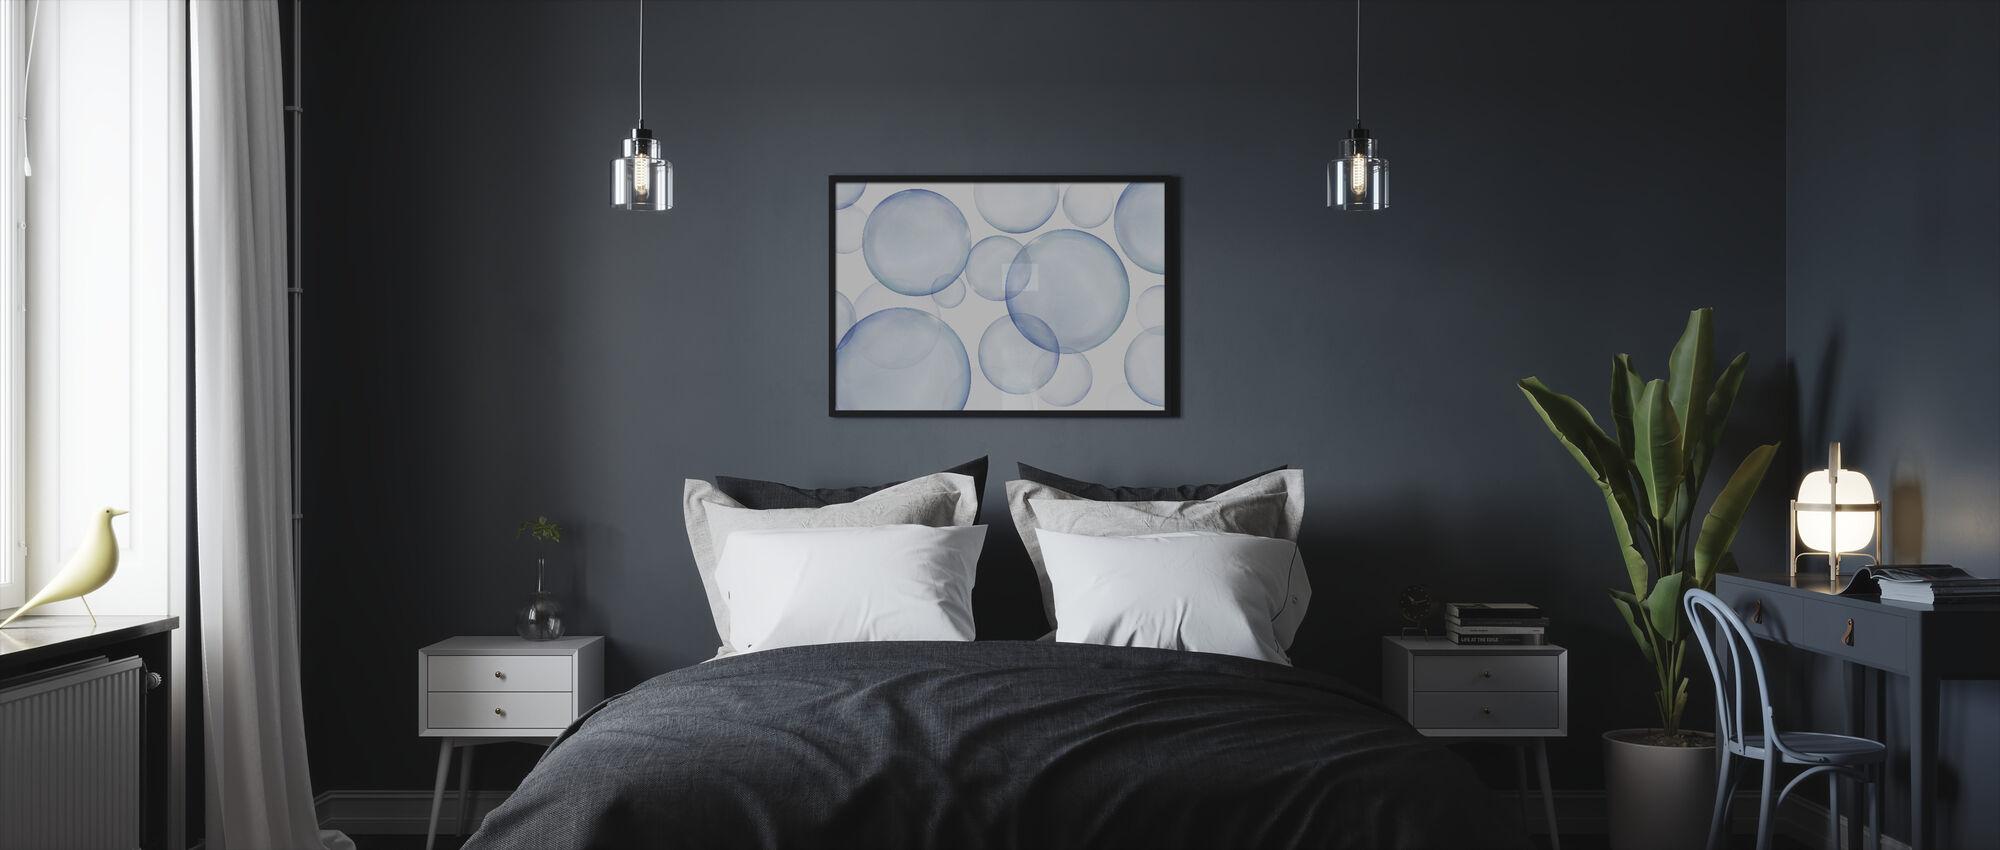 Rising Bubbles - Framed print - Bedroom